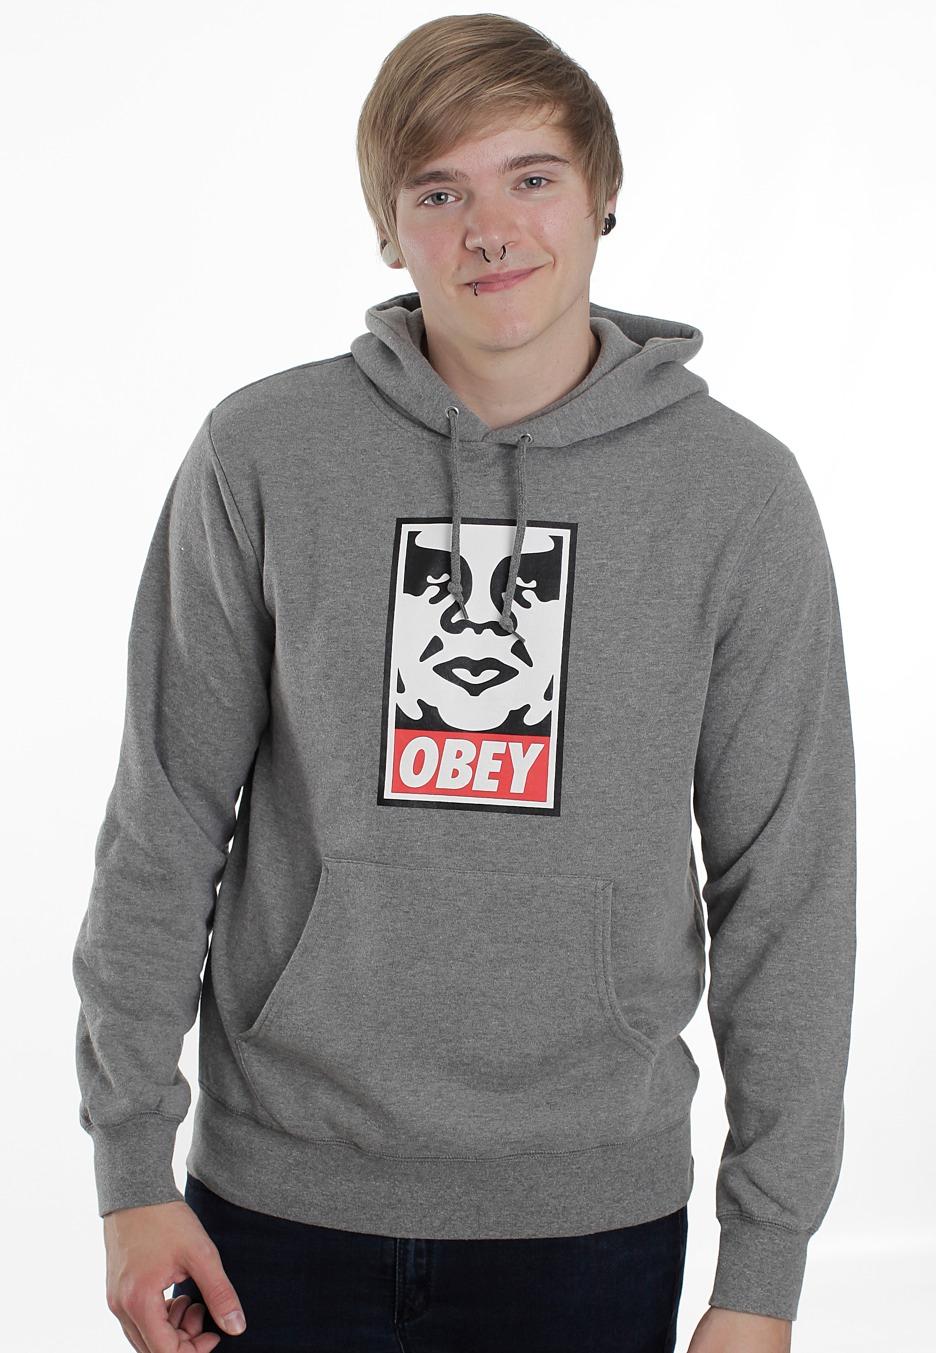 Obey - OG Face Heather Grey - Hoodie - Streetwear Shop ...